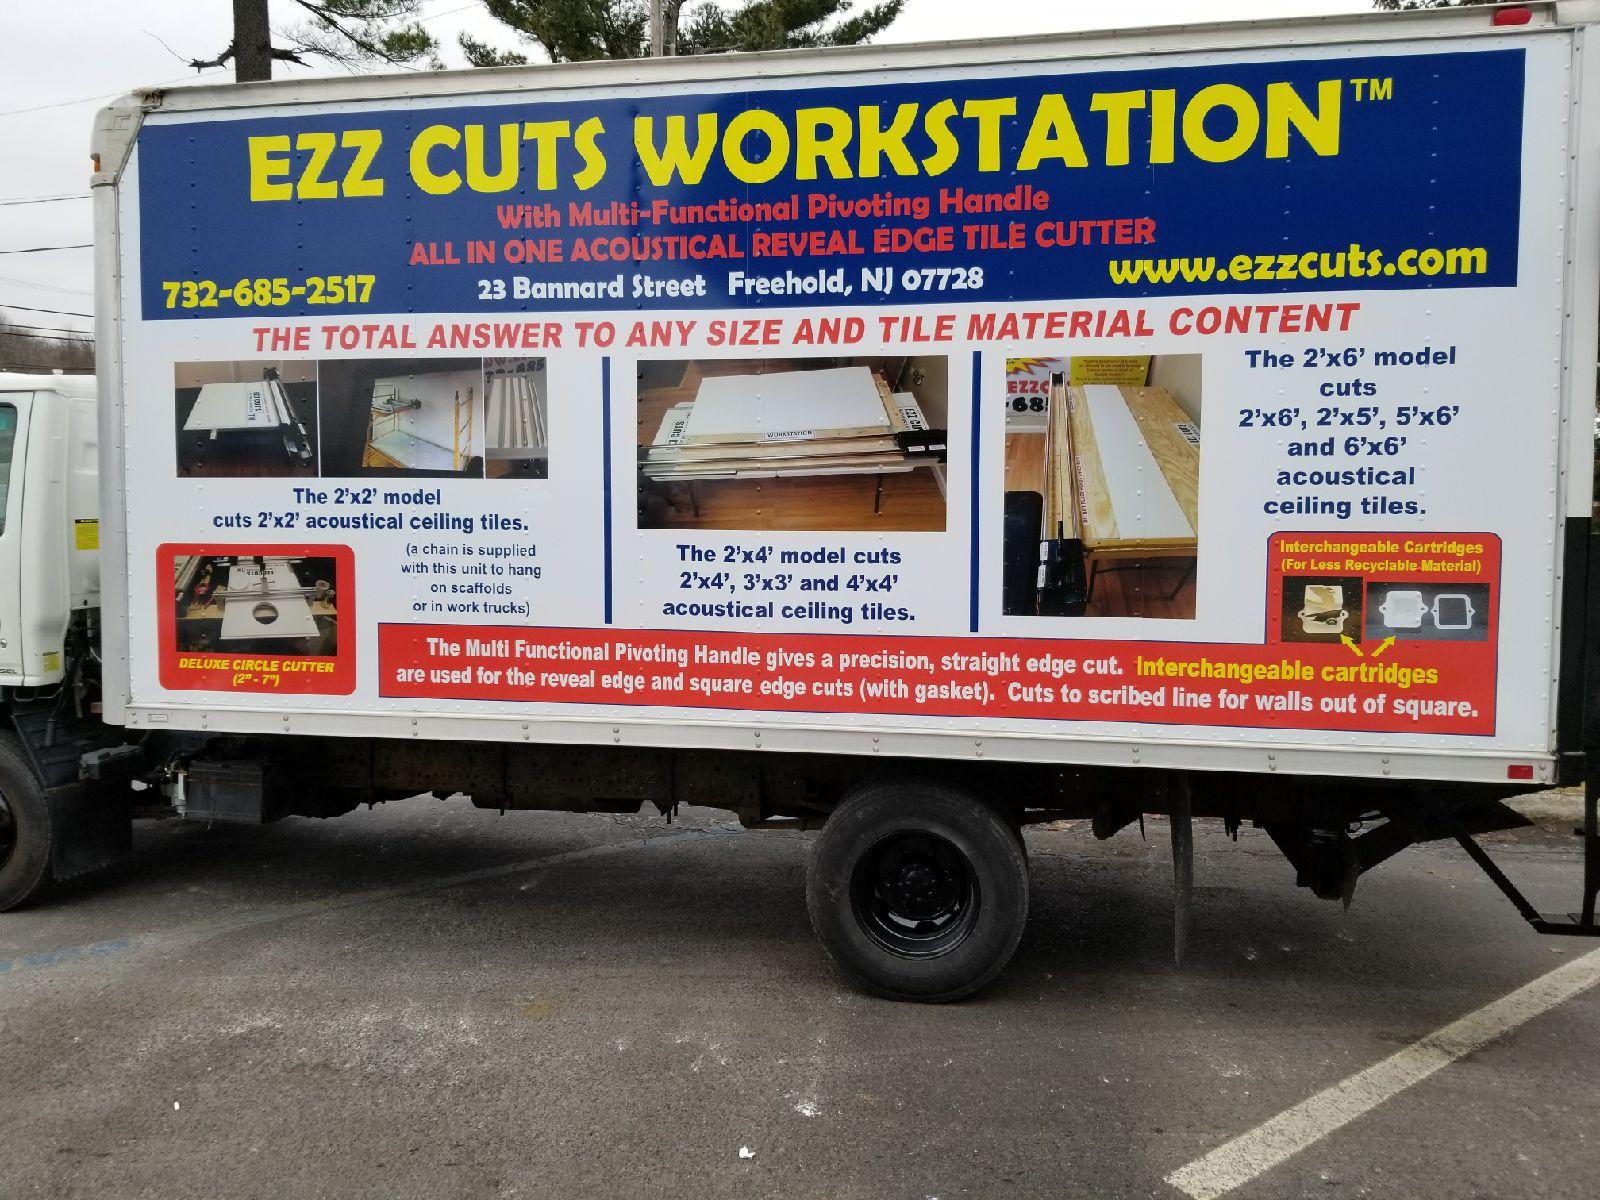 Ezz Cuts Workstation